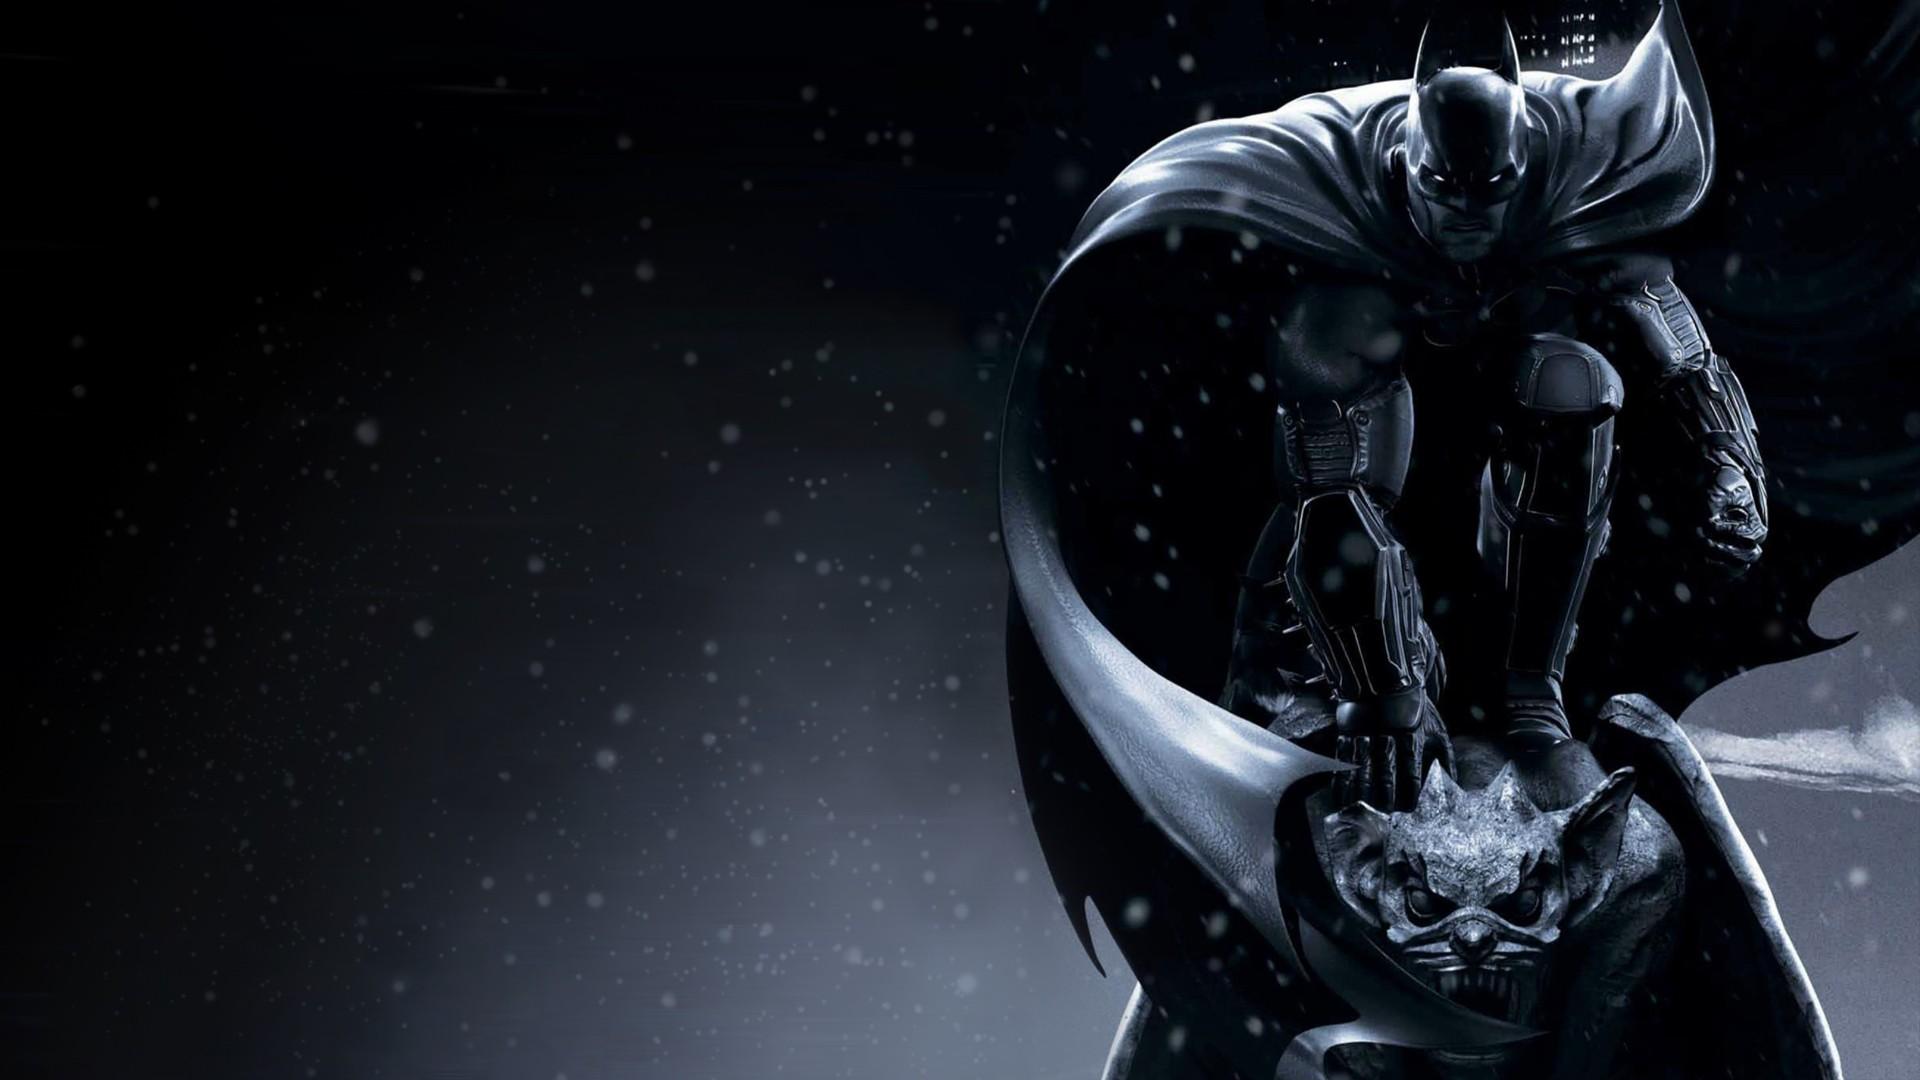 Batman Arkham Origins 2013 Wallpapers HD Wallpapers 1920x1080